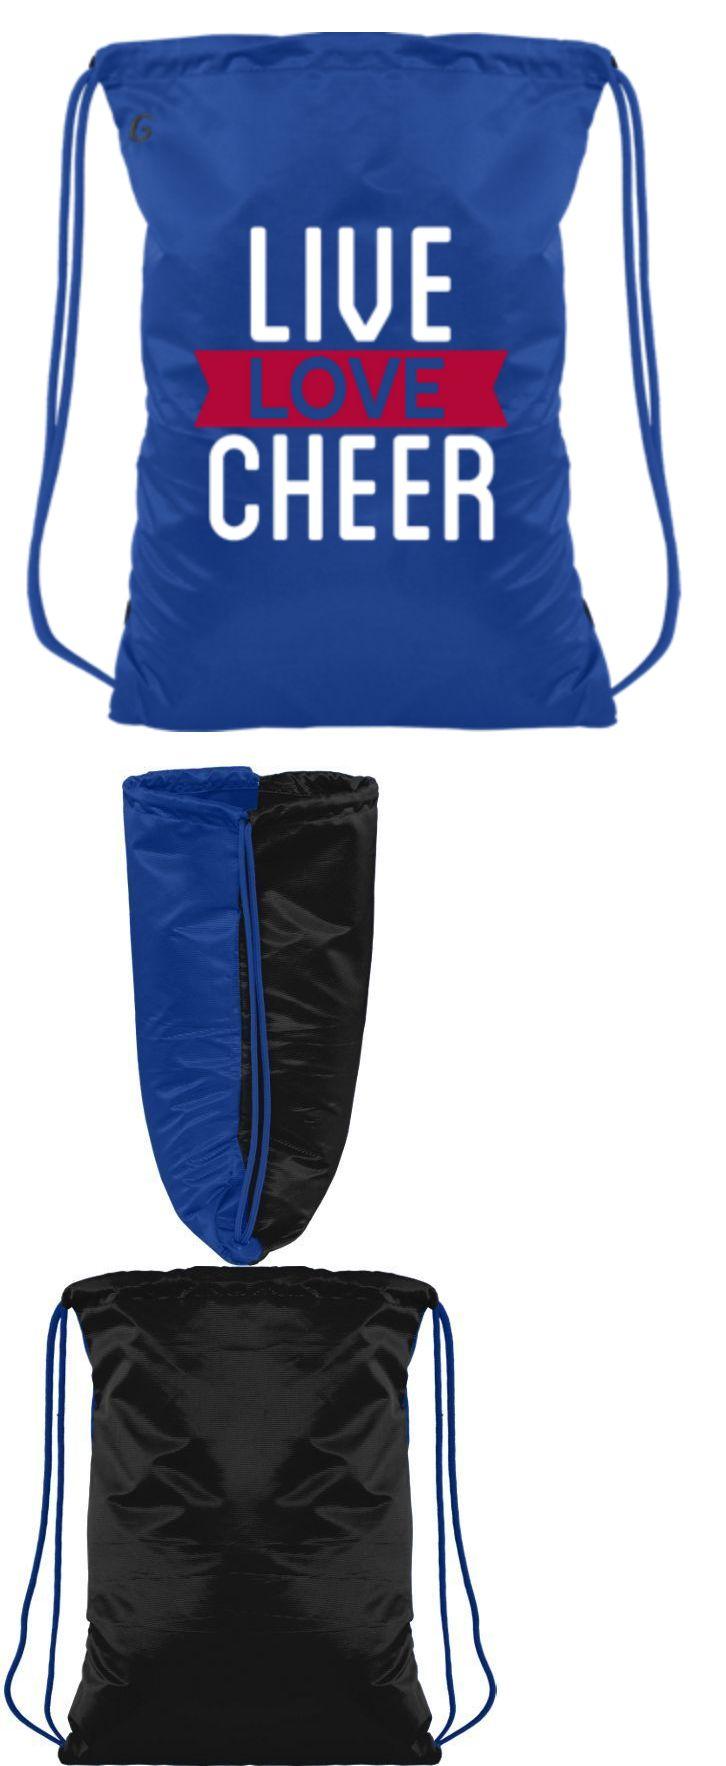 e8bac7da15ce Live Love Cheer Cheerleader Drawstring Backpack Cheerleading Blue ...